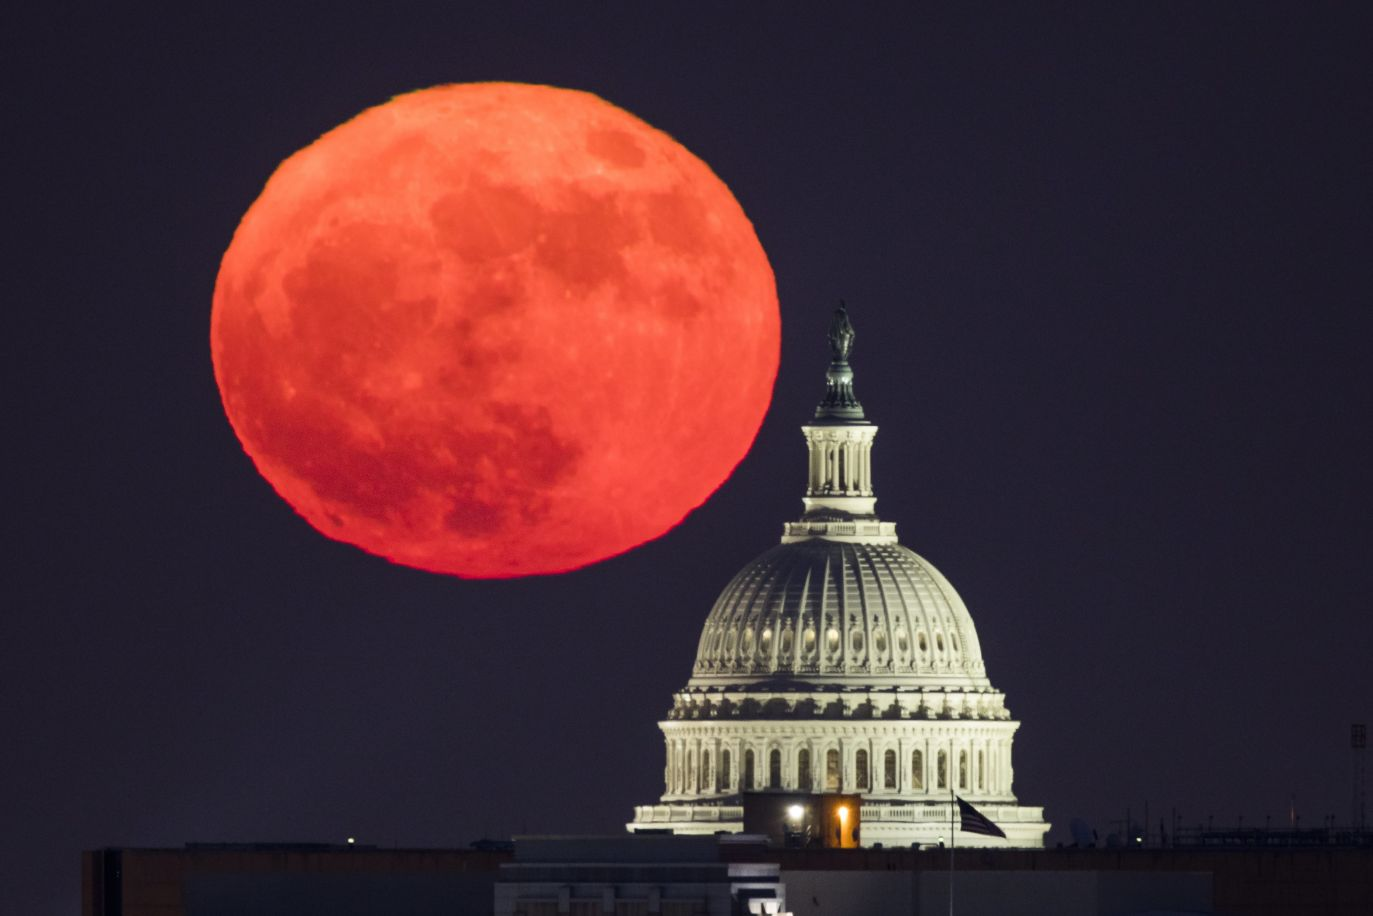 Waszyngton (fot. PAP/ EPA/JIM LO SCALZO)